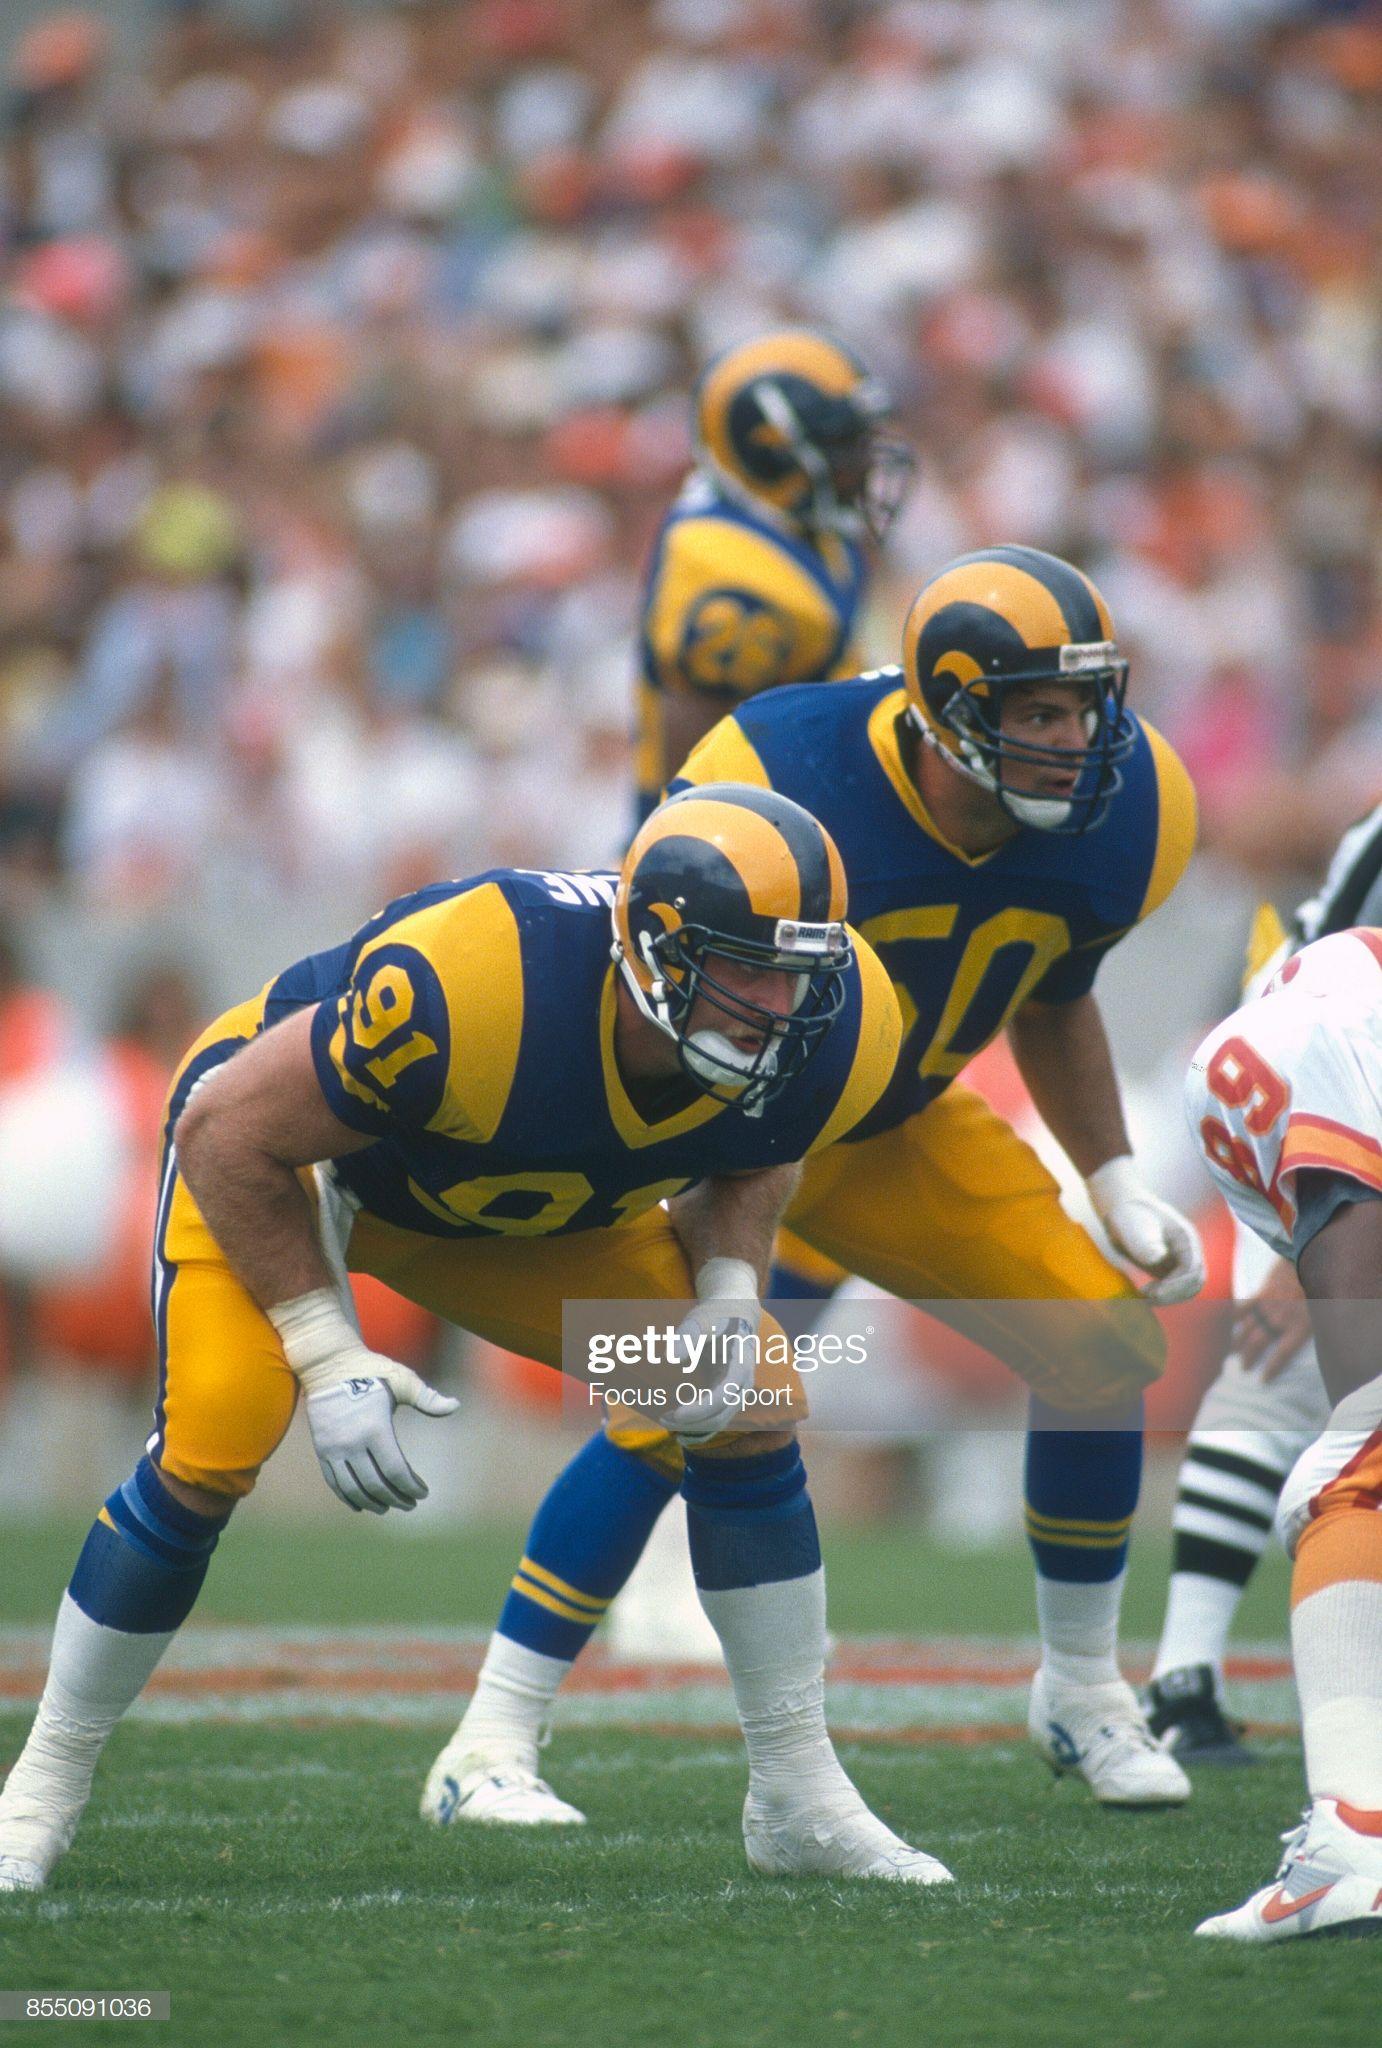 Kevin Greene Rams Rams football, Football conference